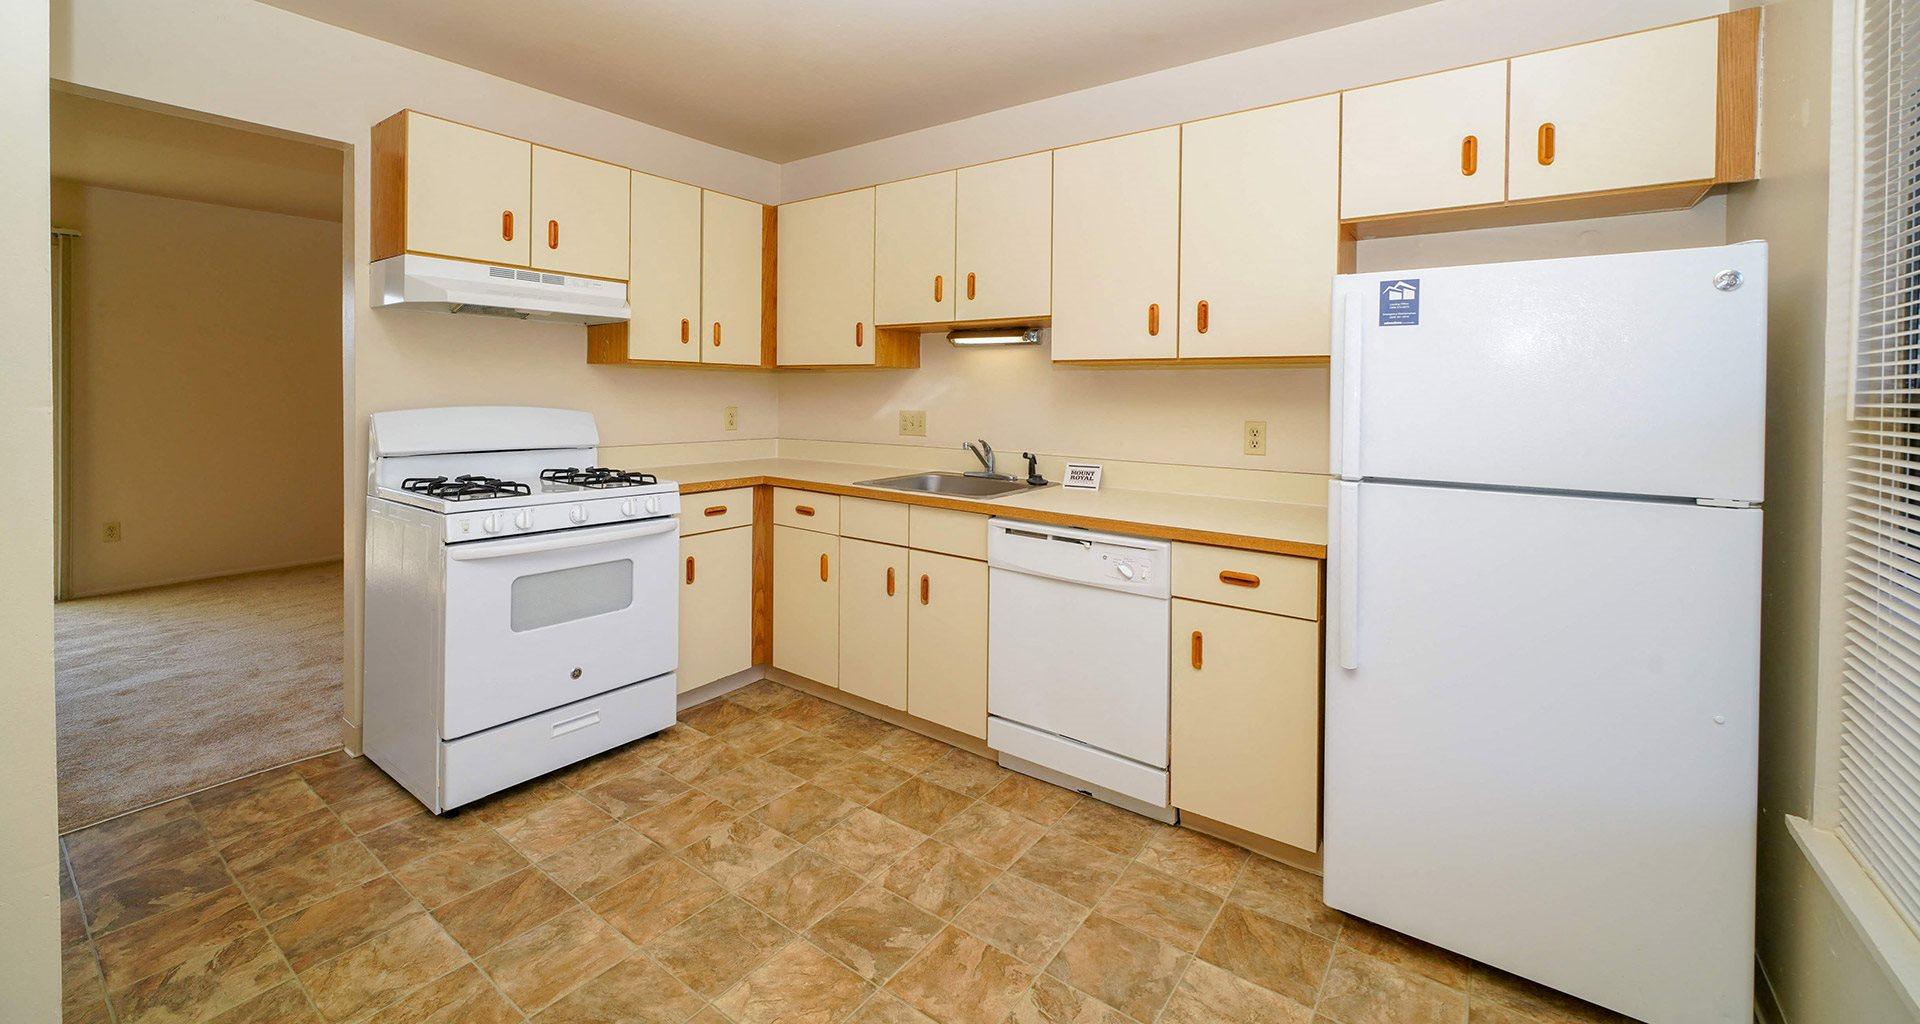 White Appliances in Kitchen at Mount Royal Townhomes, Kalamazoo, MI